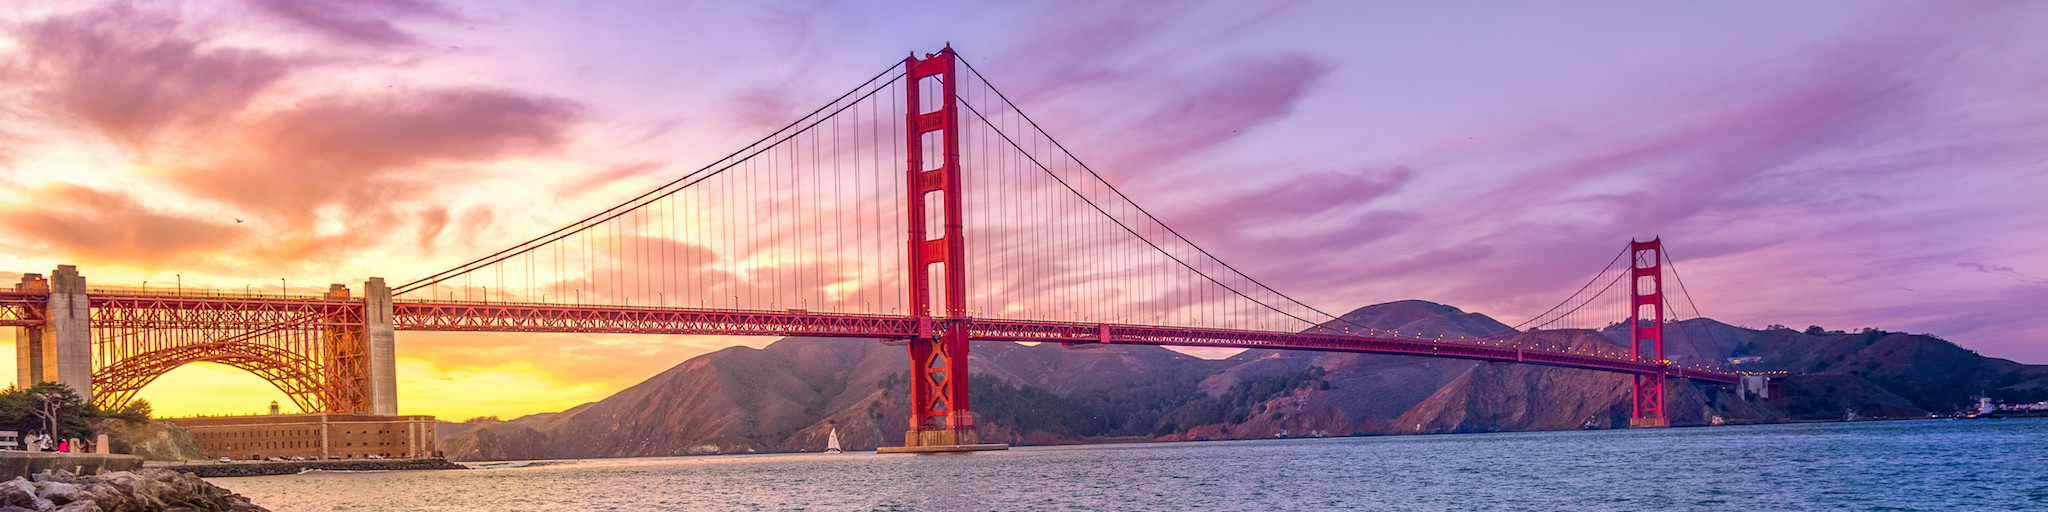 Golden Gate bridge image - public domain photo via Good Free Photos